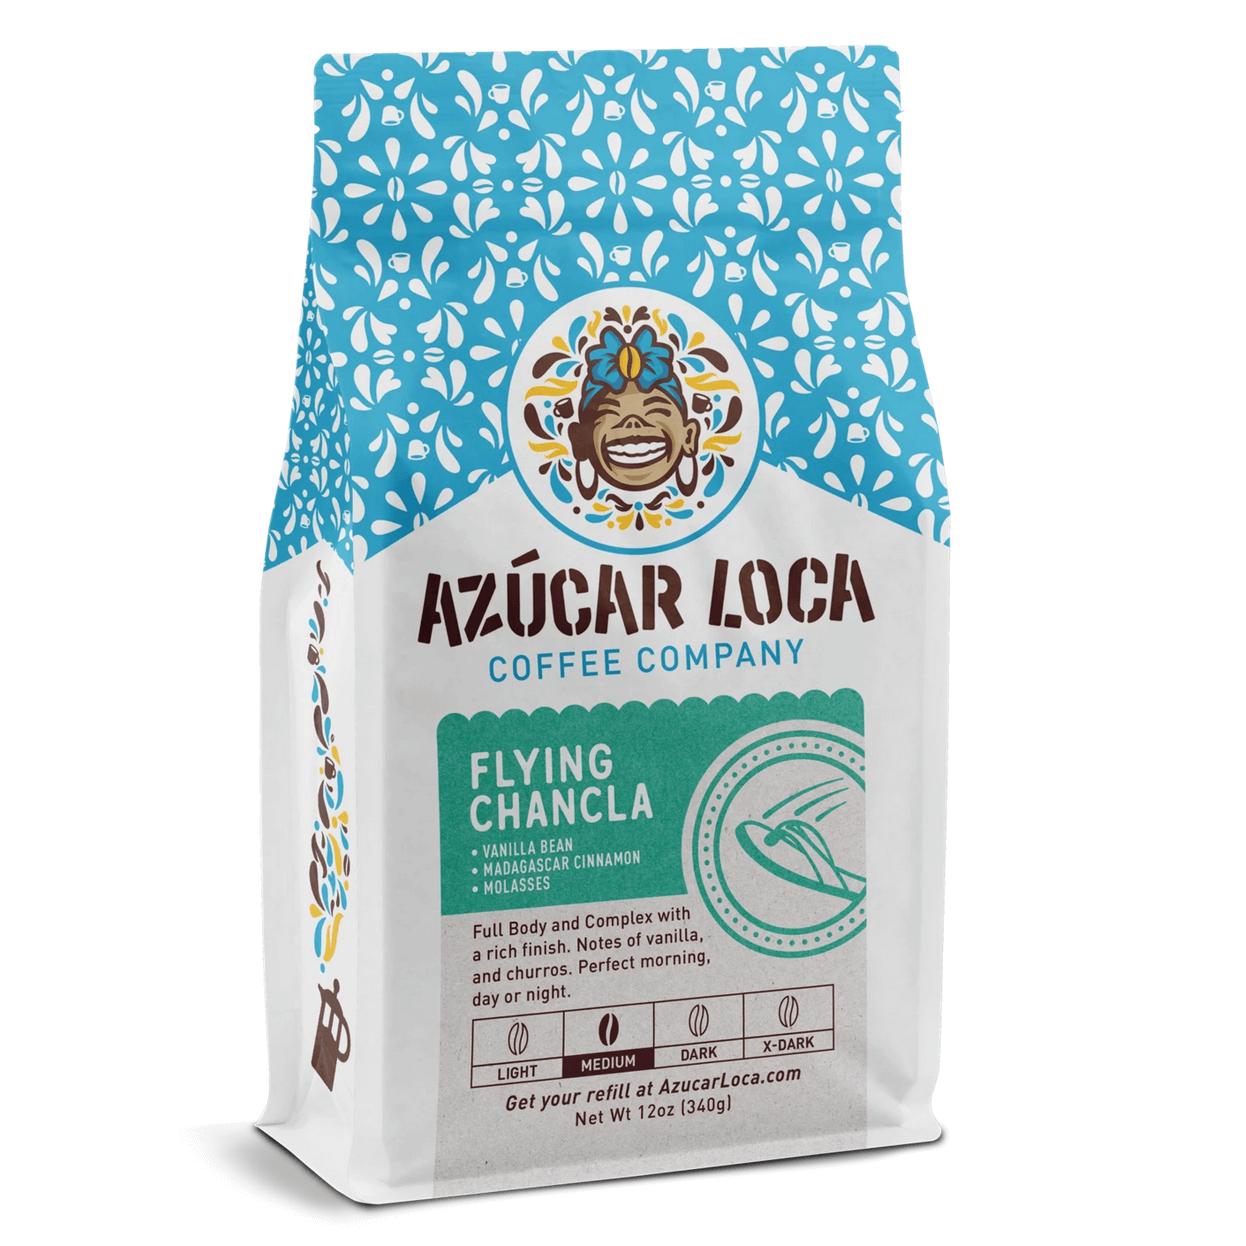 Flying Chancla from Azucar Loca Coffee Company